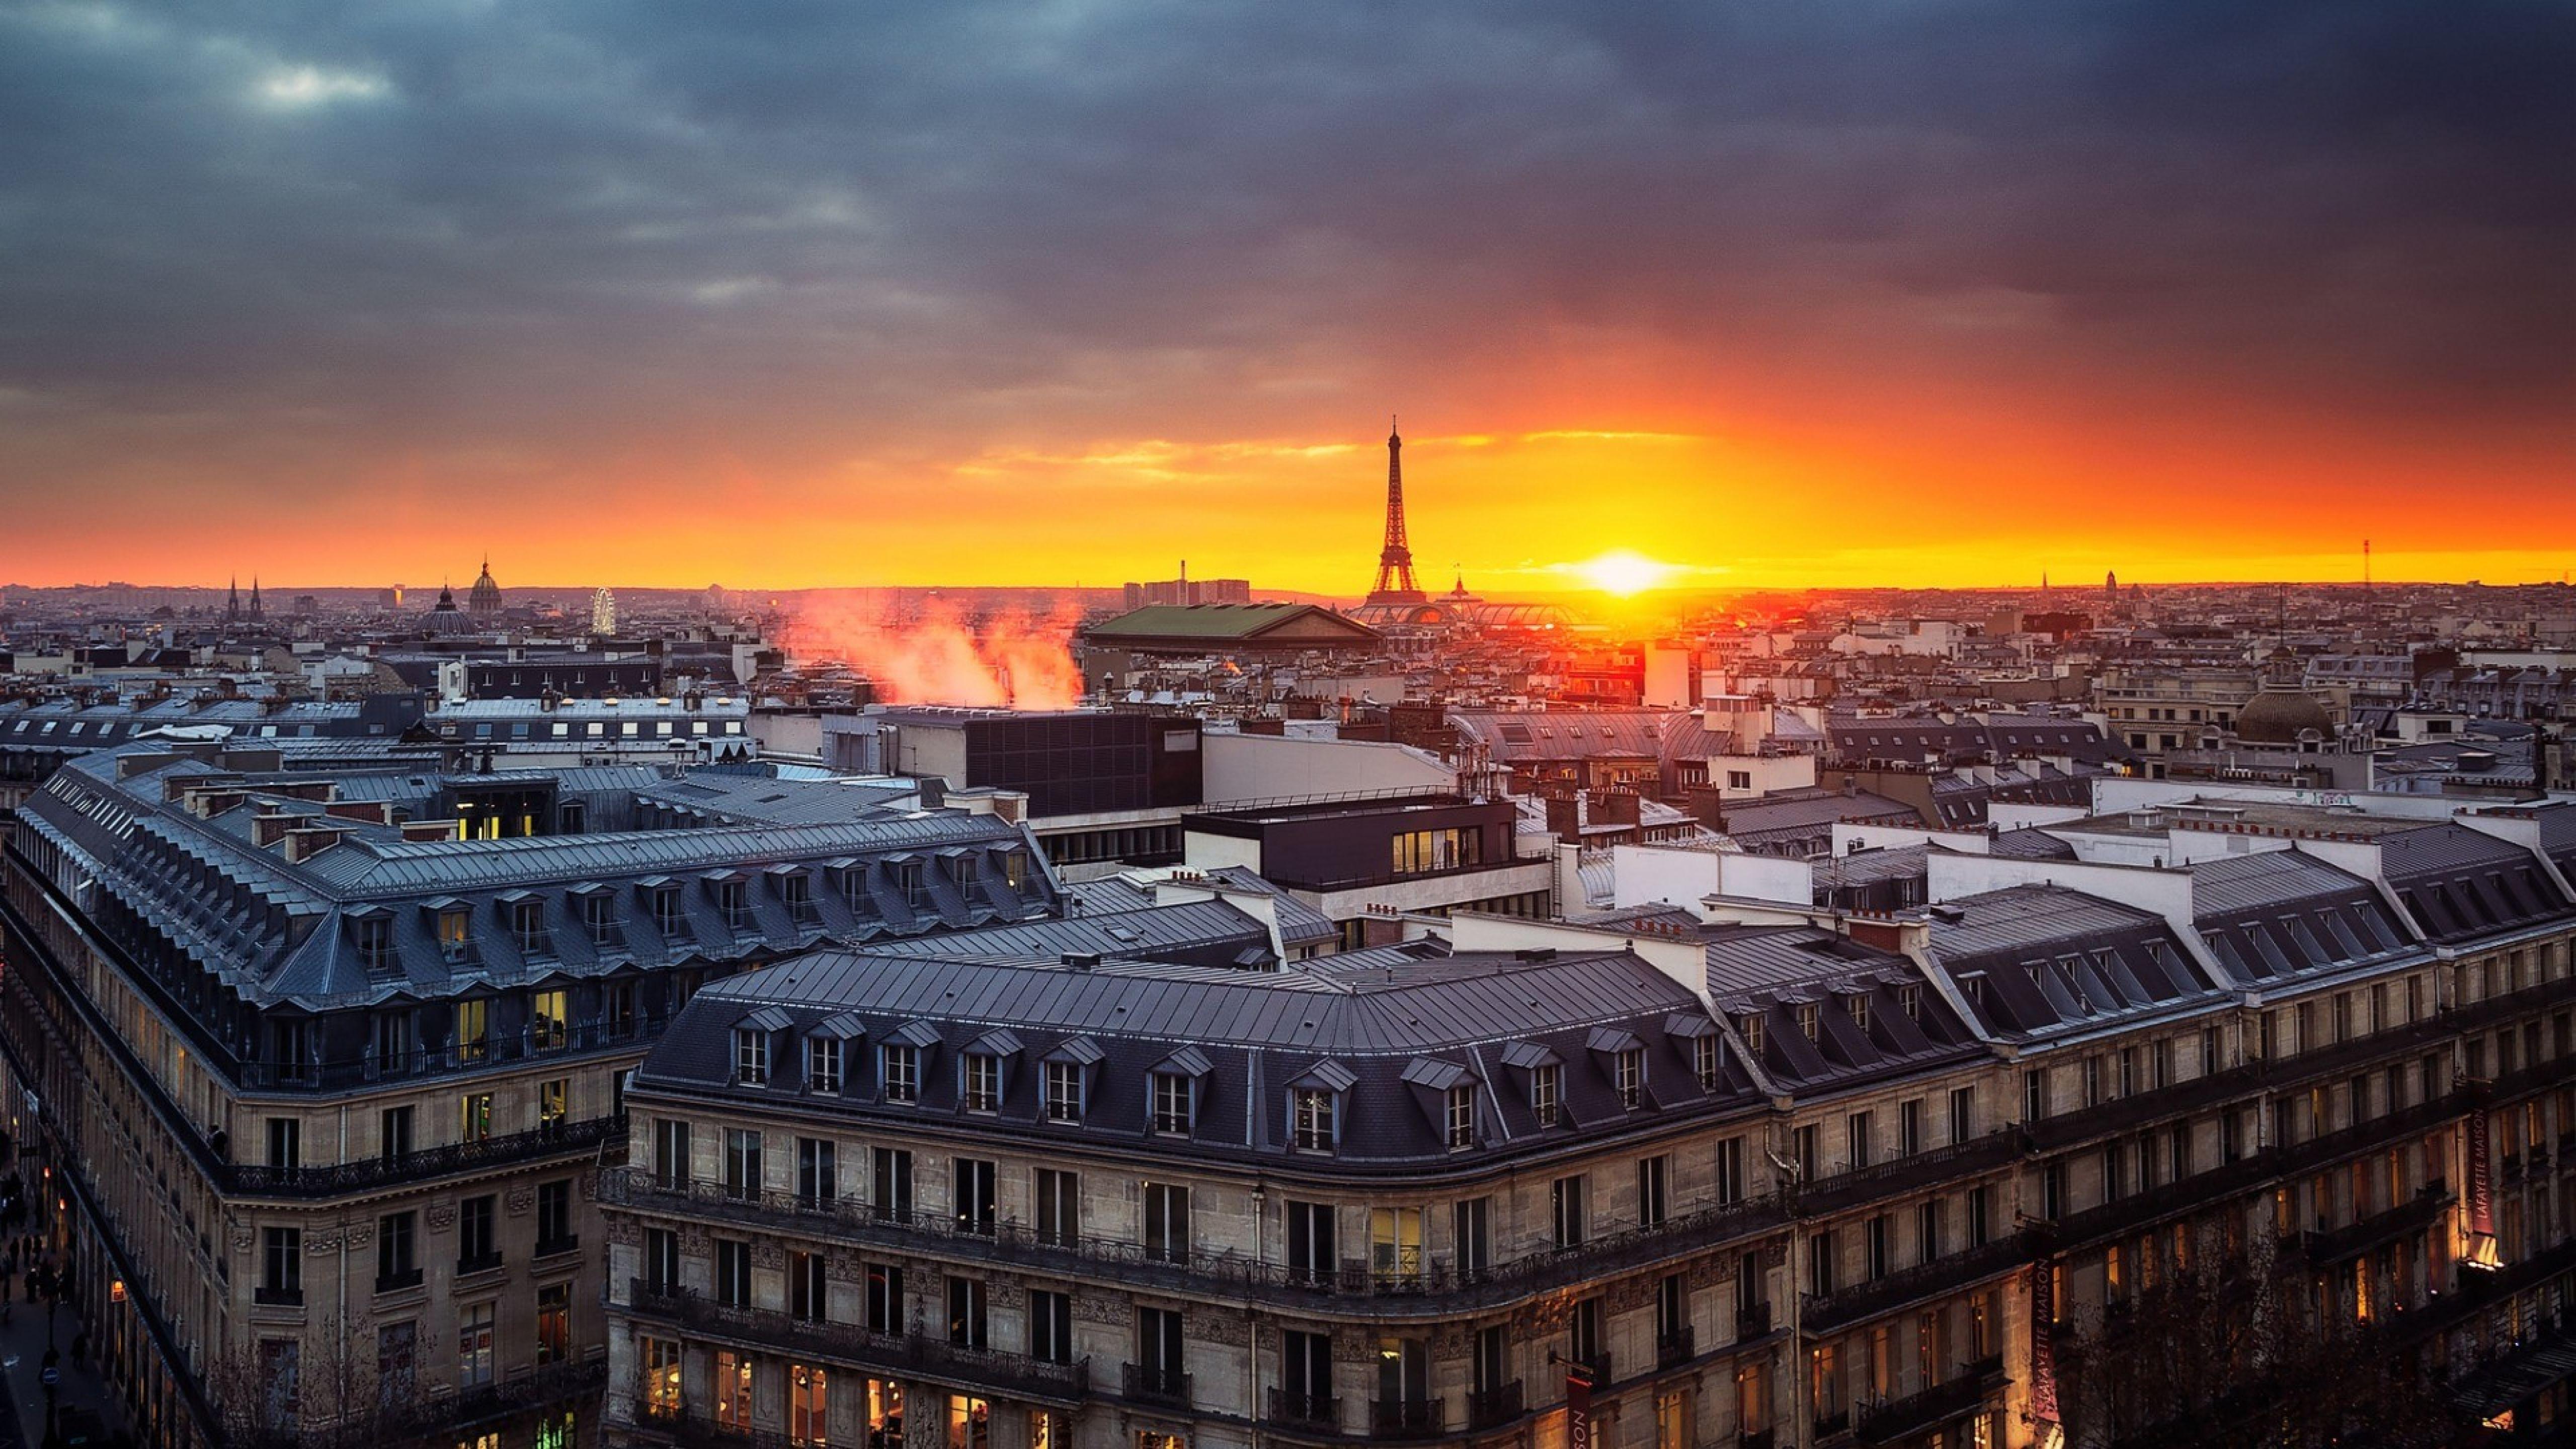 Paris 5k Wallpapers Top Free Paris 5k Backgrounds Wallpaperaccess